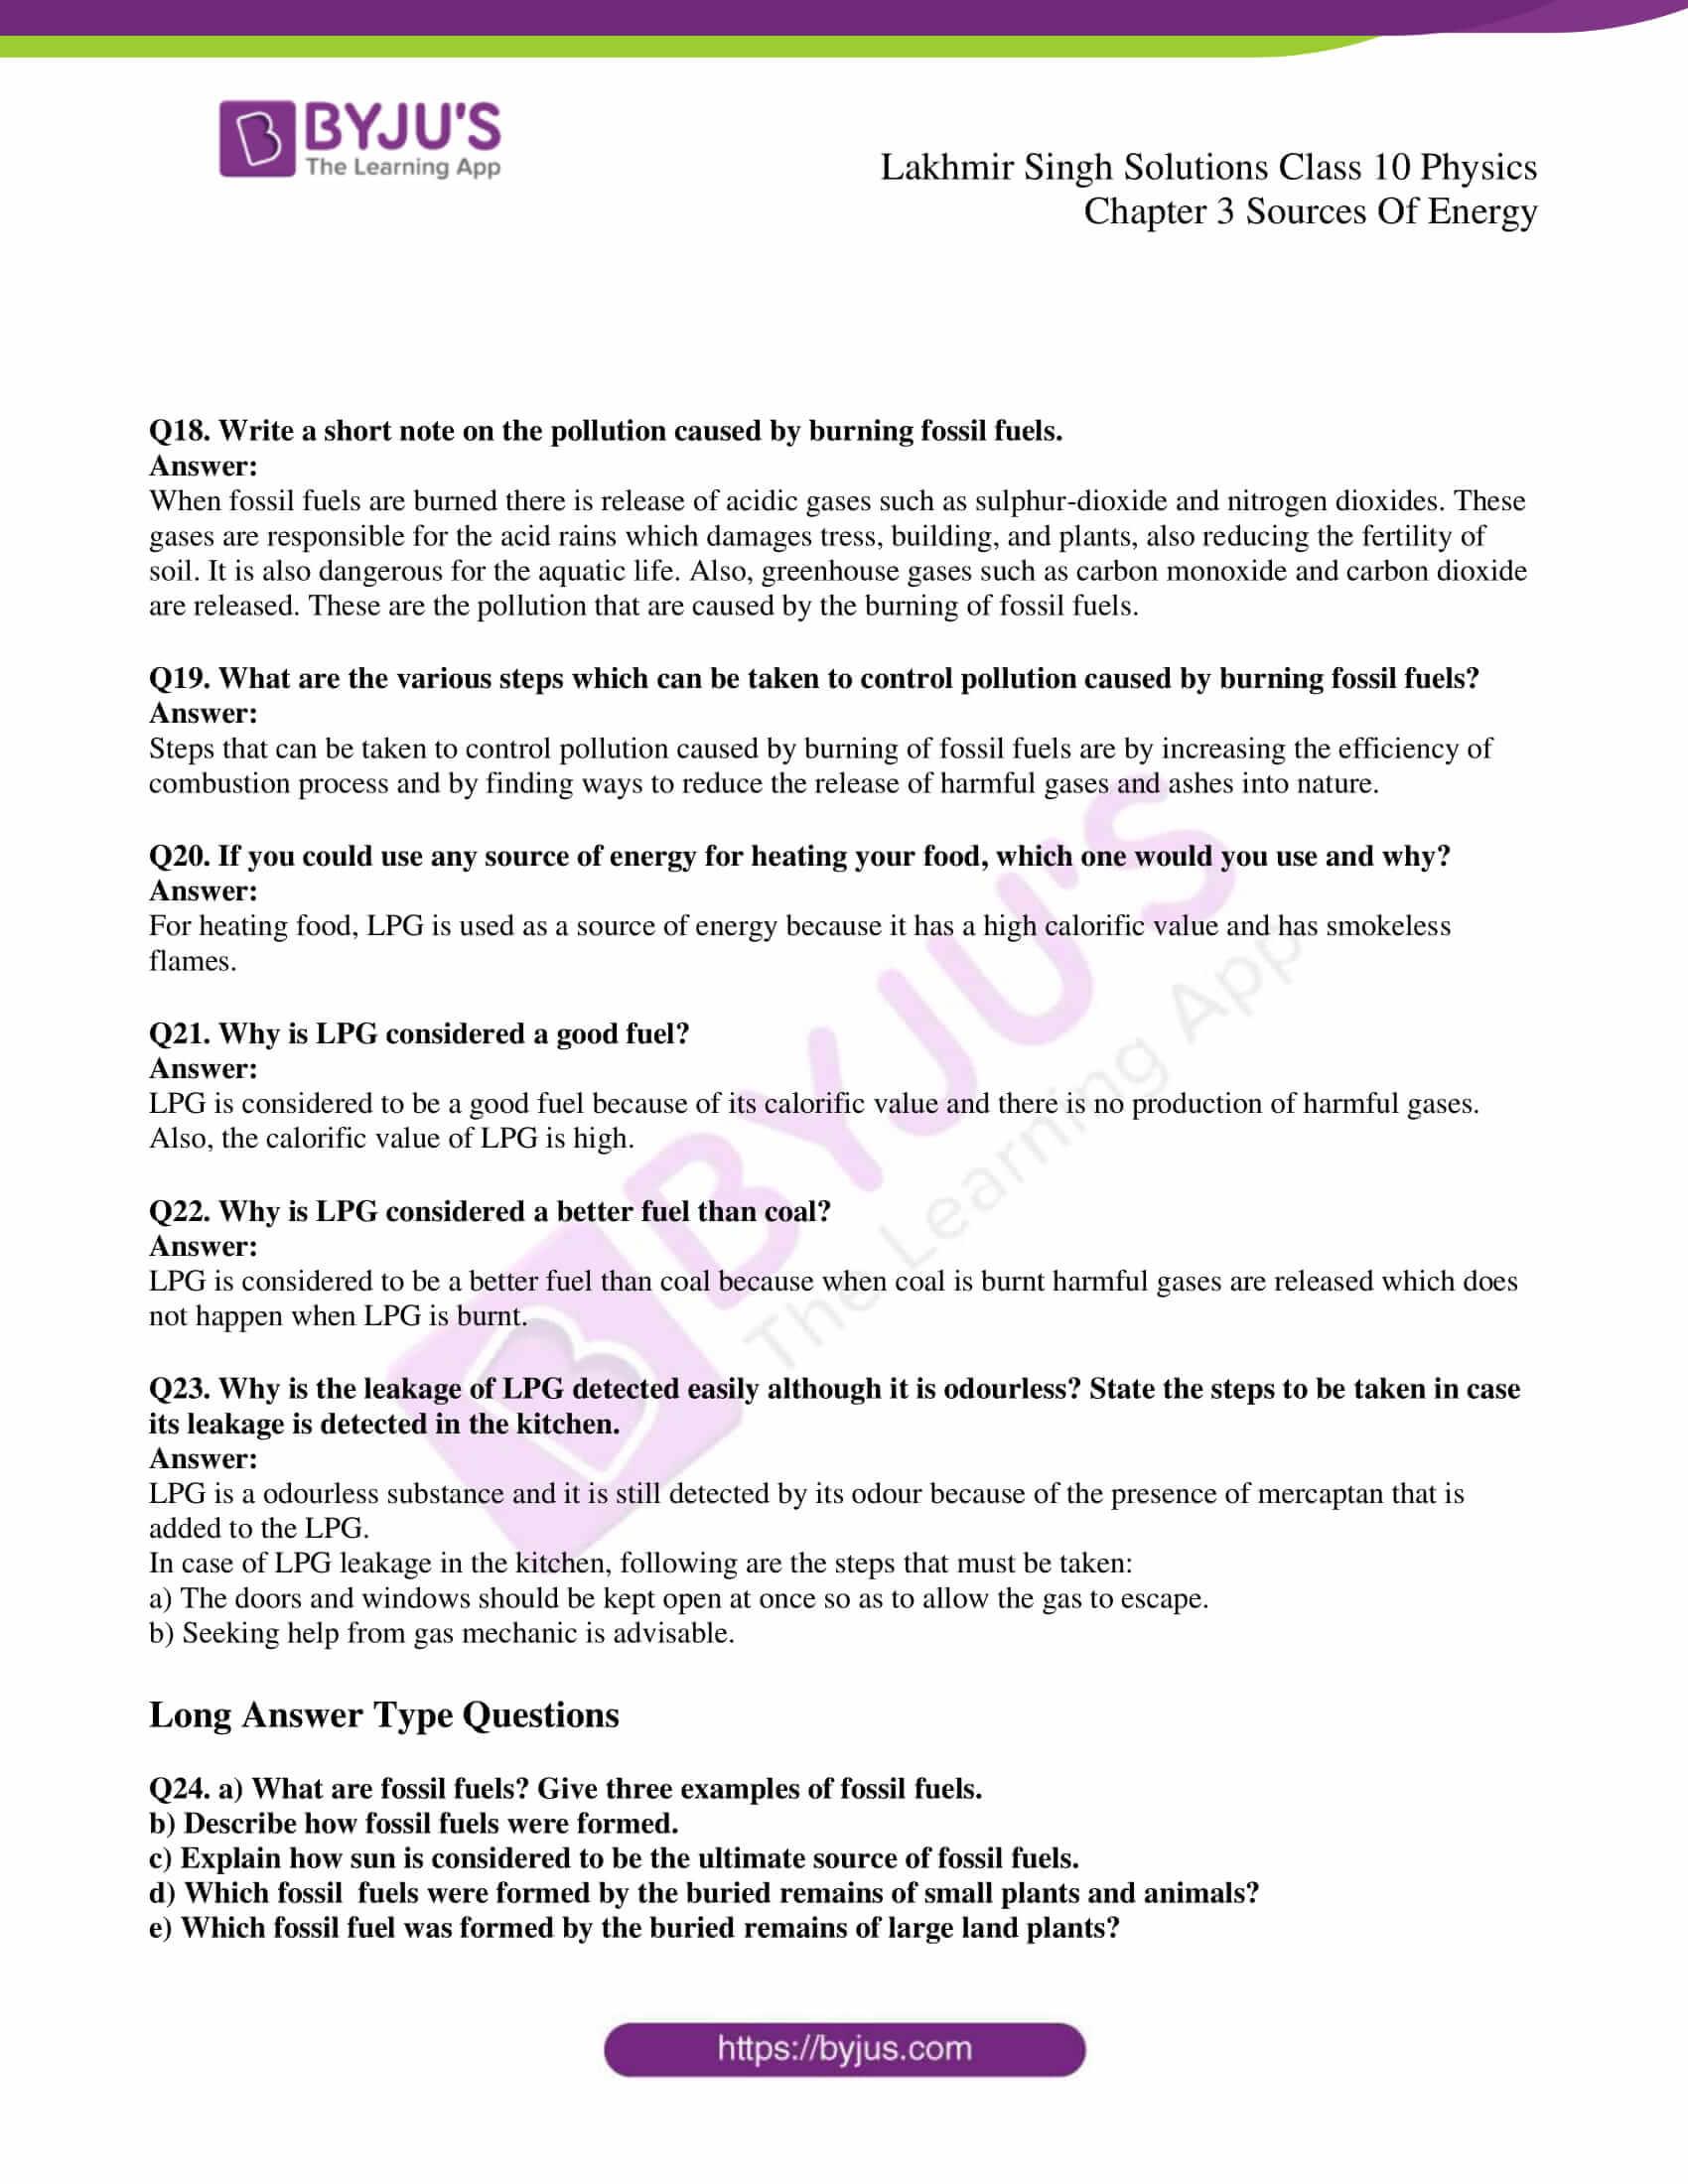 lakhmir singh sol class 10 physics chapter 3 09